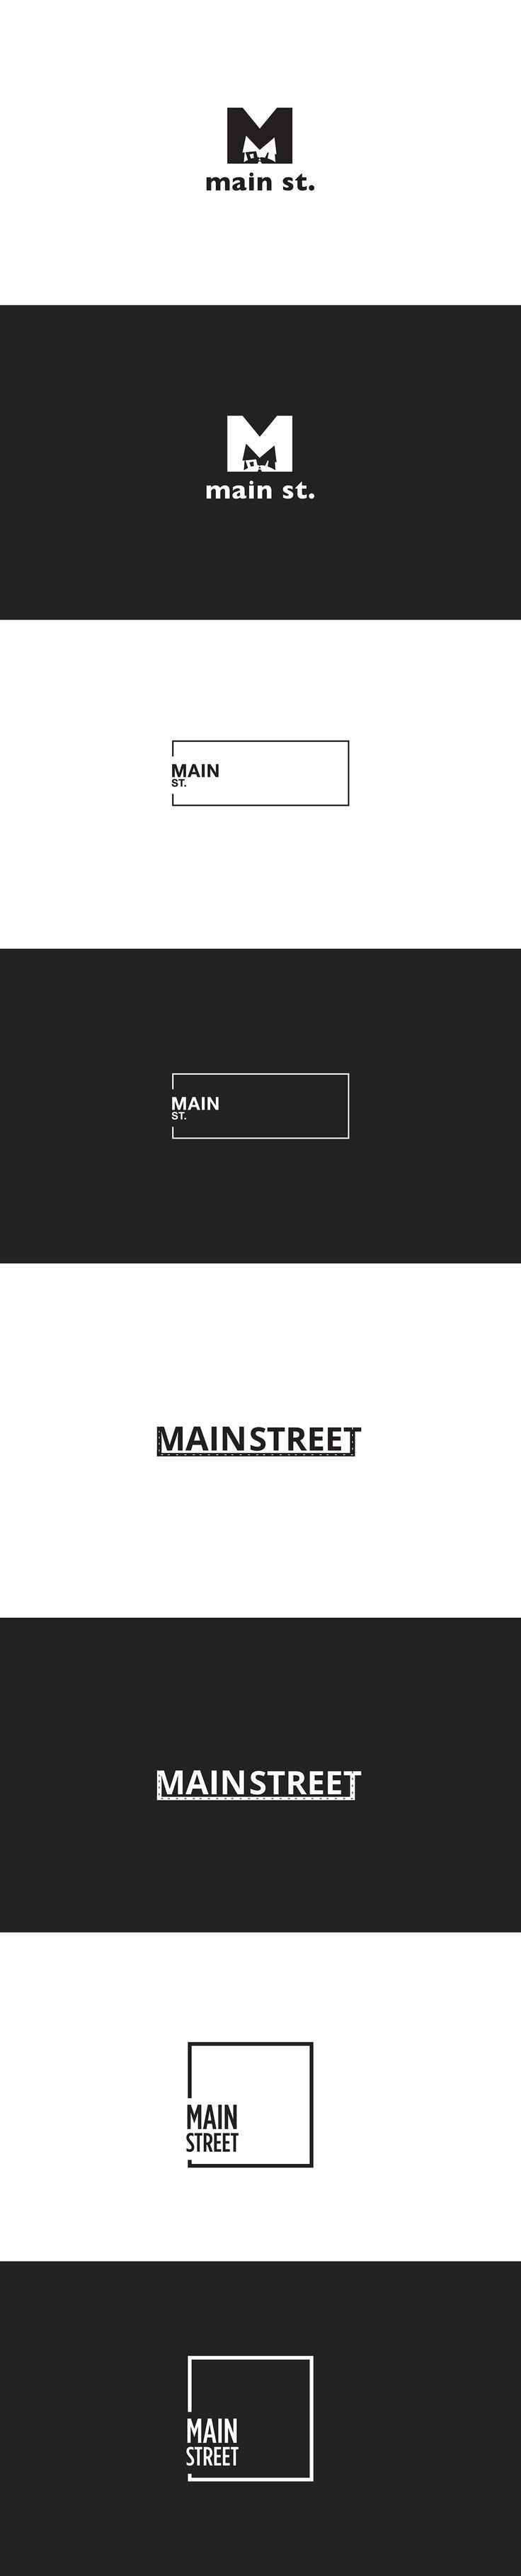 Main Street Themes Logo Design Concepts from Kelowna Marketing Agency, Twirling Umbrellas Ltd.